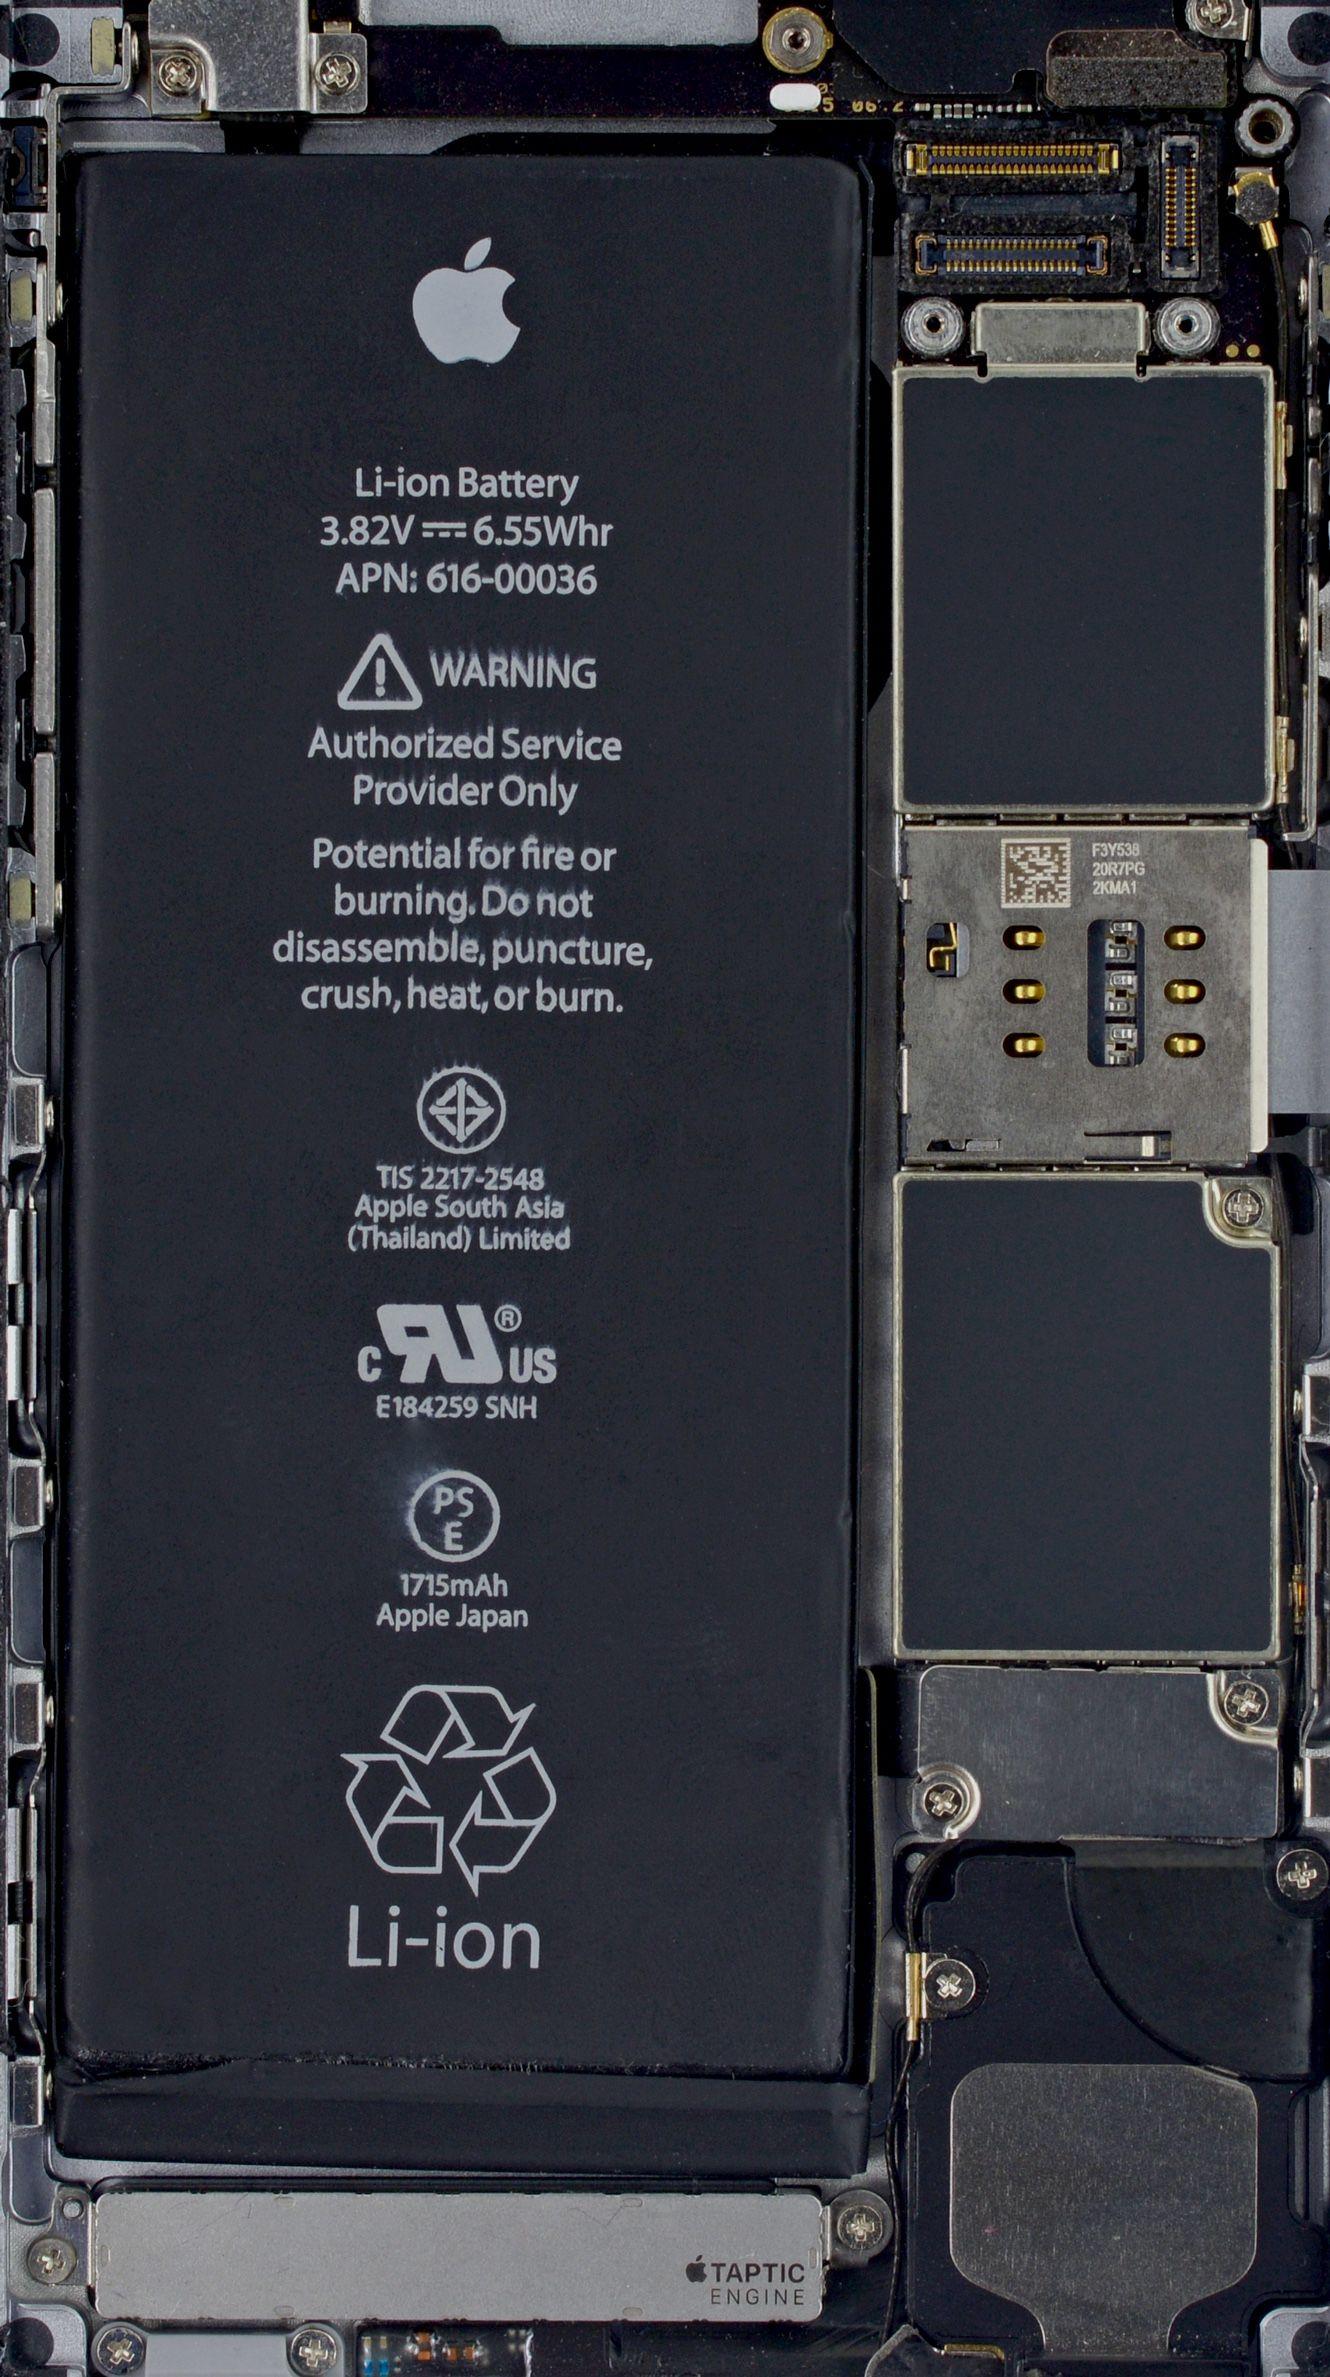 Iphone 6s inside wallpaper | Fondos | Pinterest | Fondos, Fondos de pantalla y Pantalla